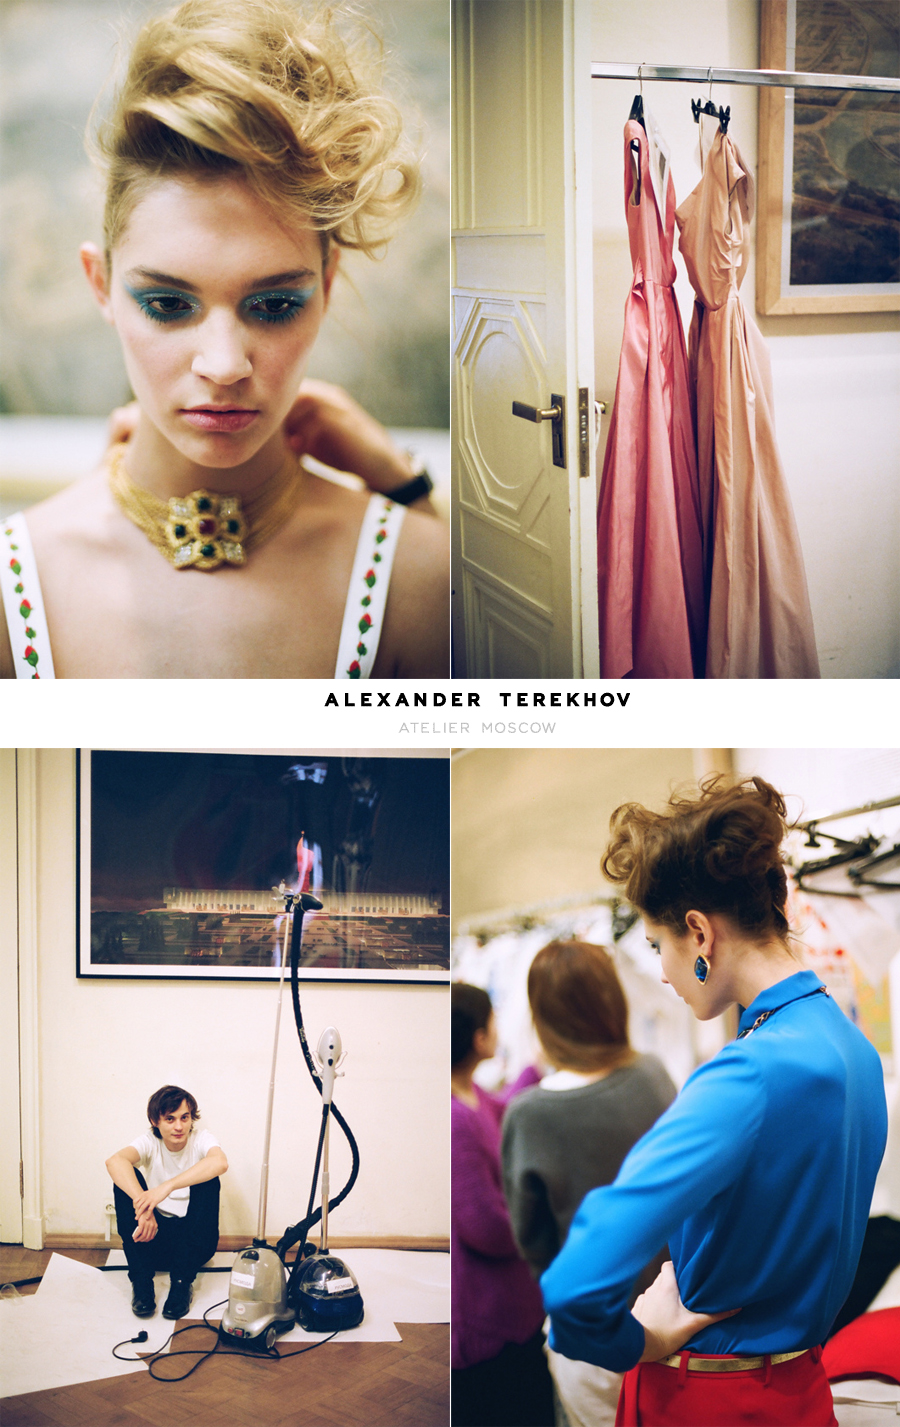 Terekhov by Katya Alagich